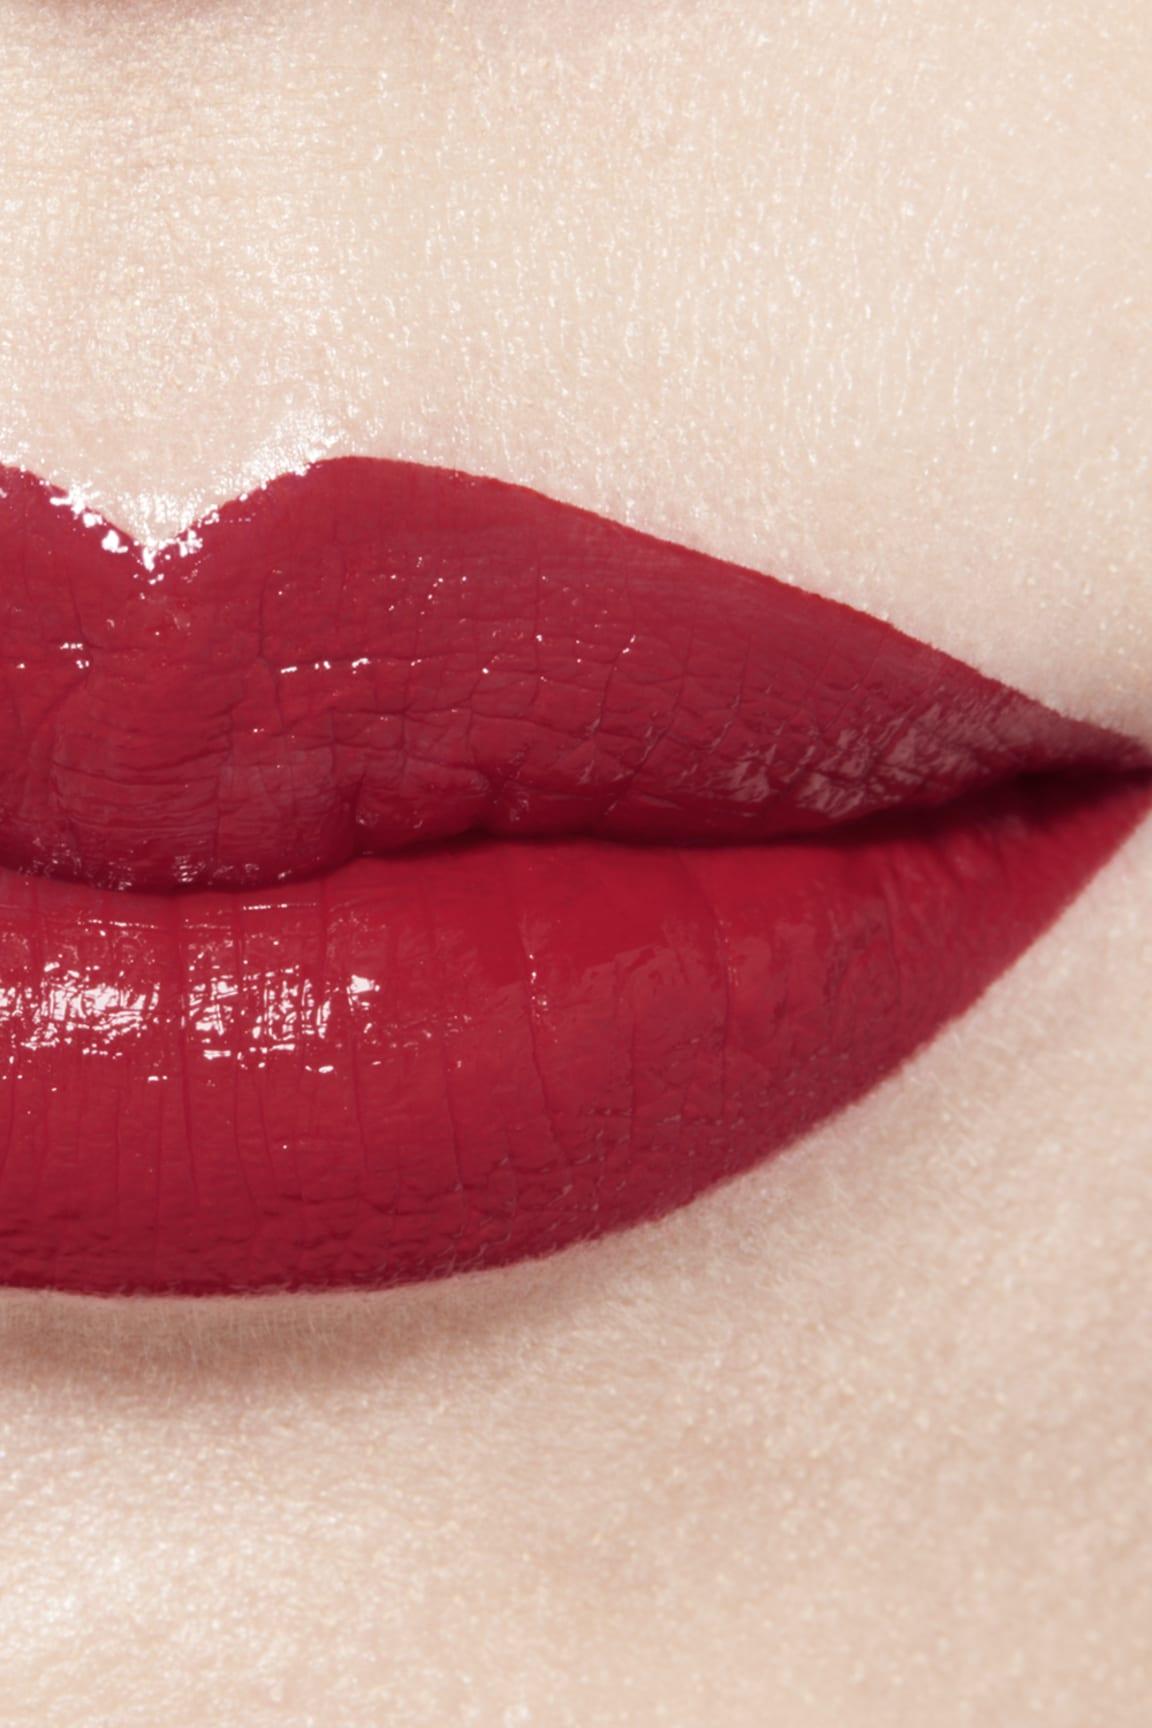 Anwendung Make-up-Bild 1 - ROUGE COCO BLOOM 138 - VITALITÉ